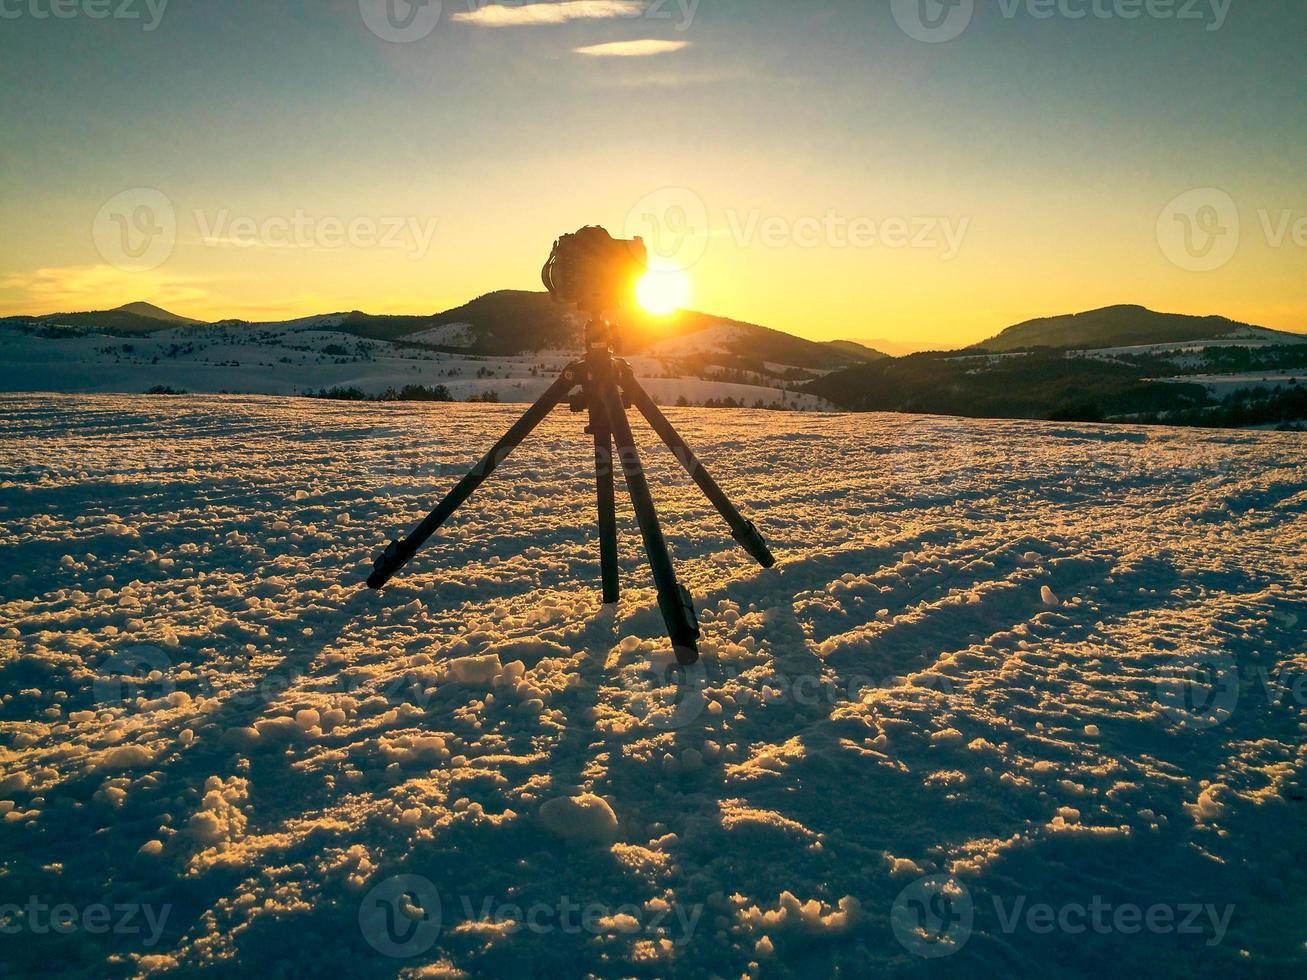 riprese di paesaggi montuosi foto